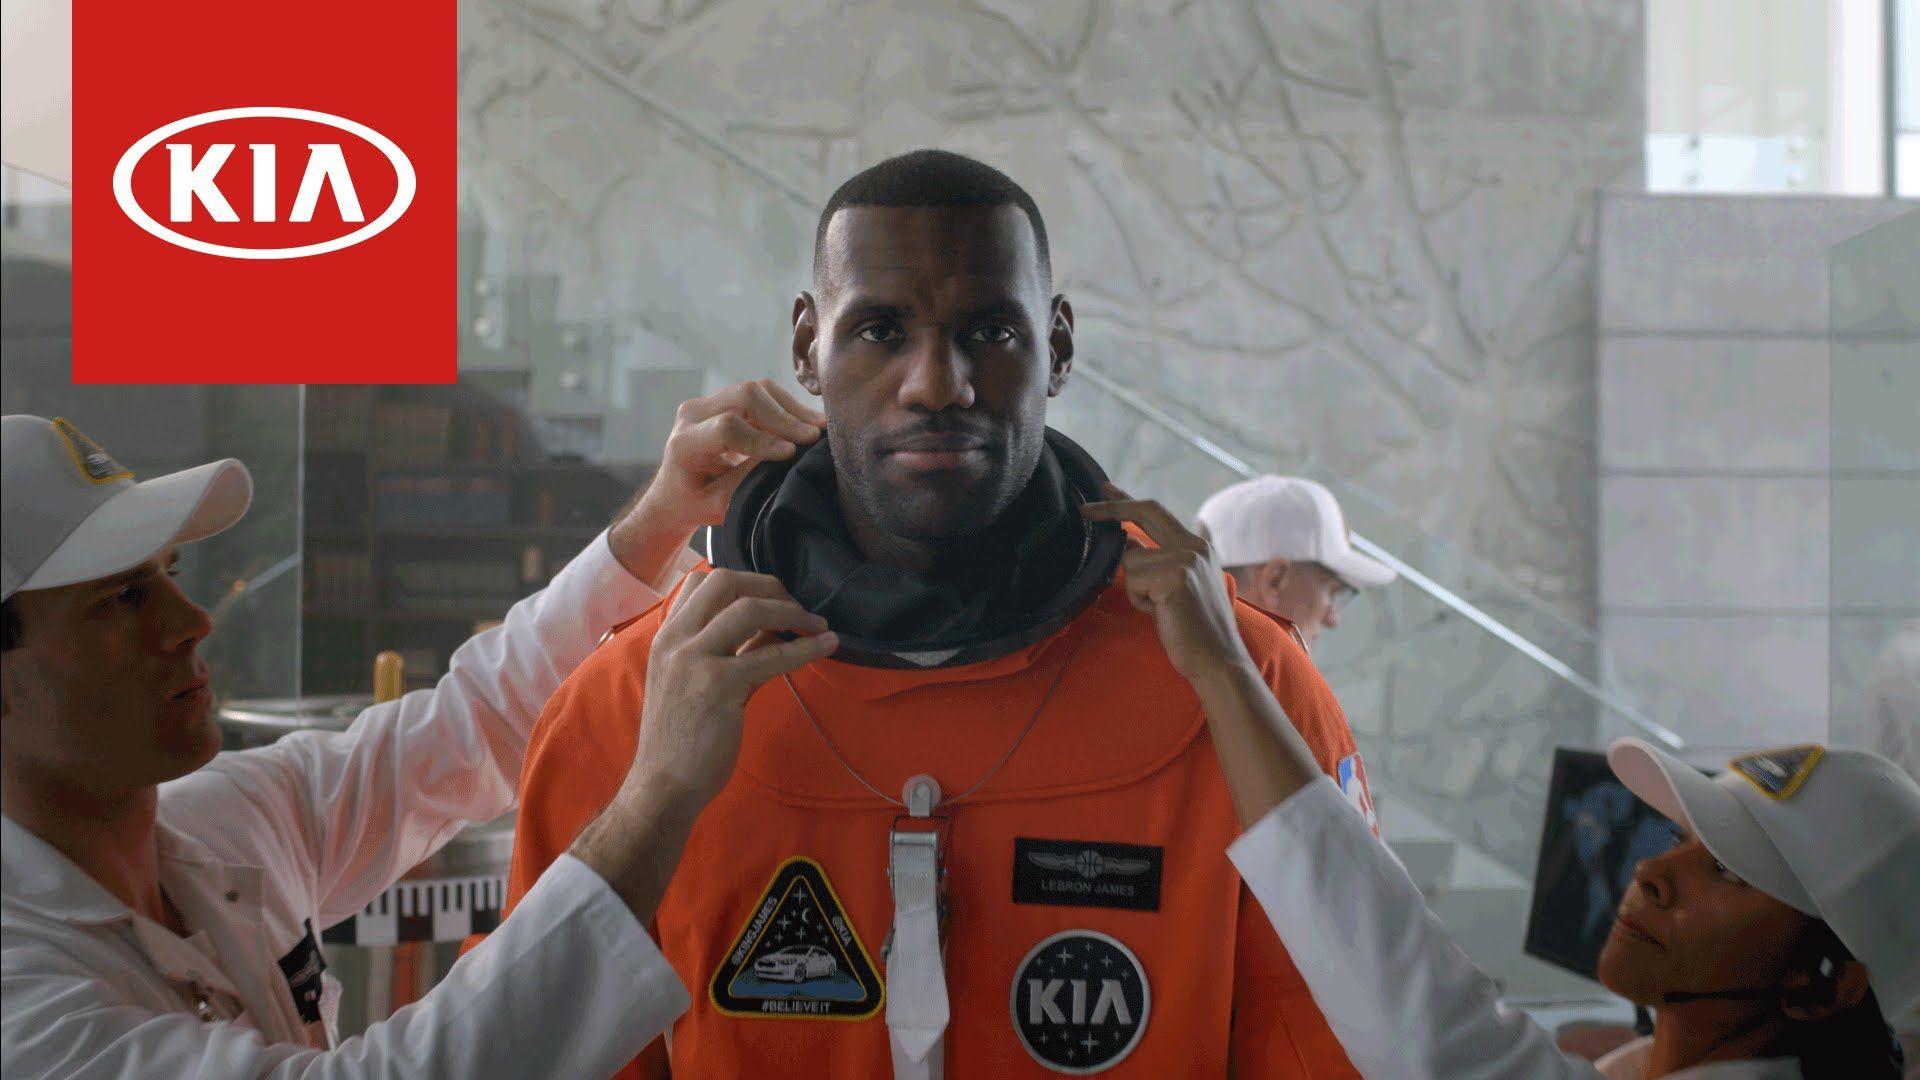 Kia K900 LeBron James Commercial Spaceship Official